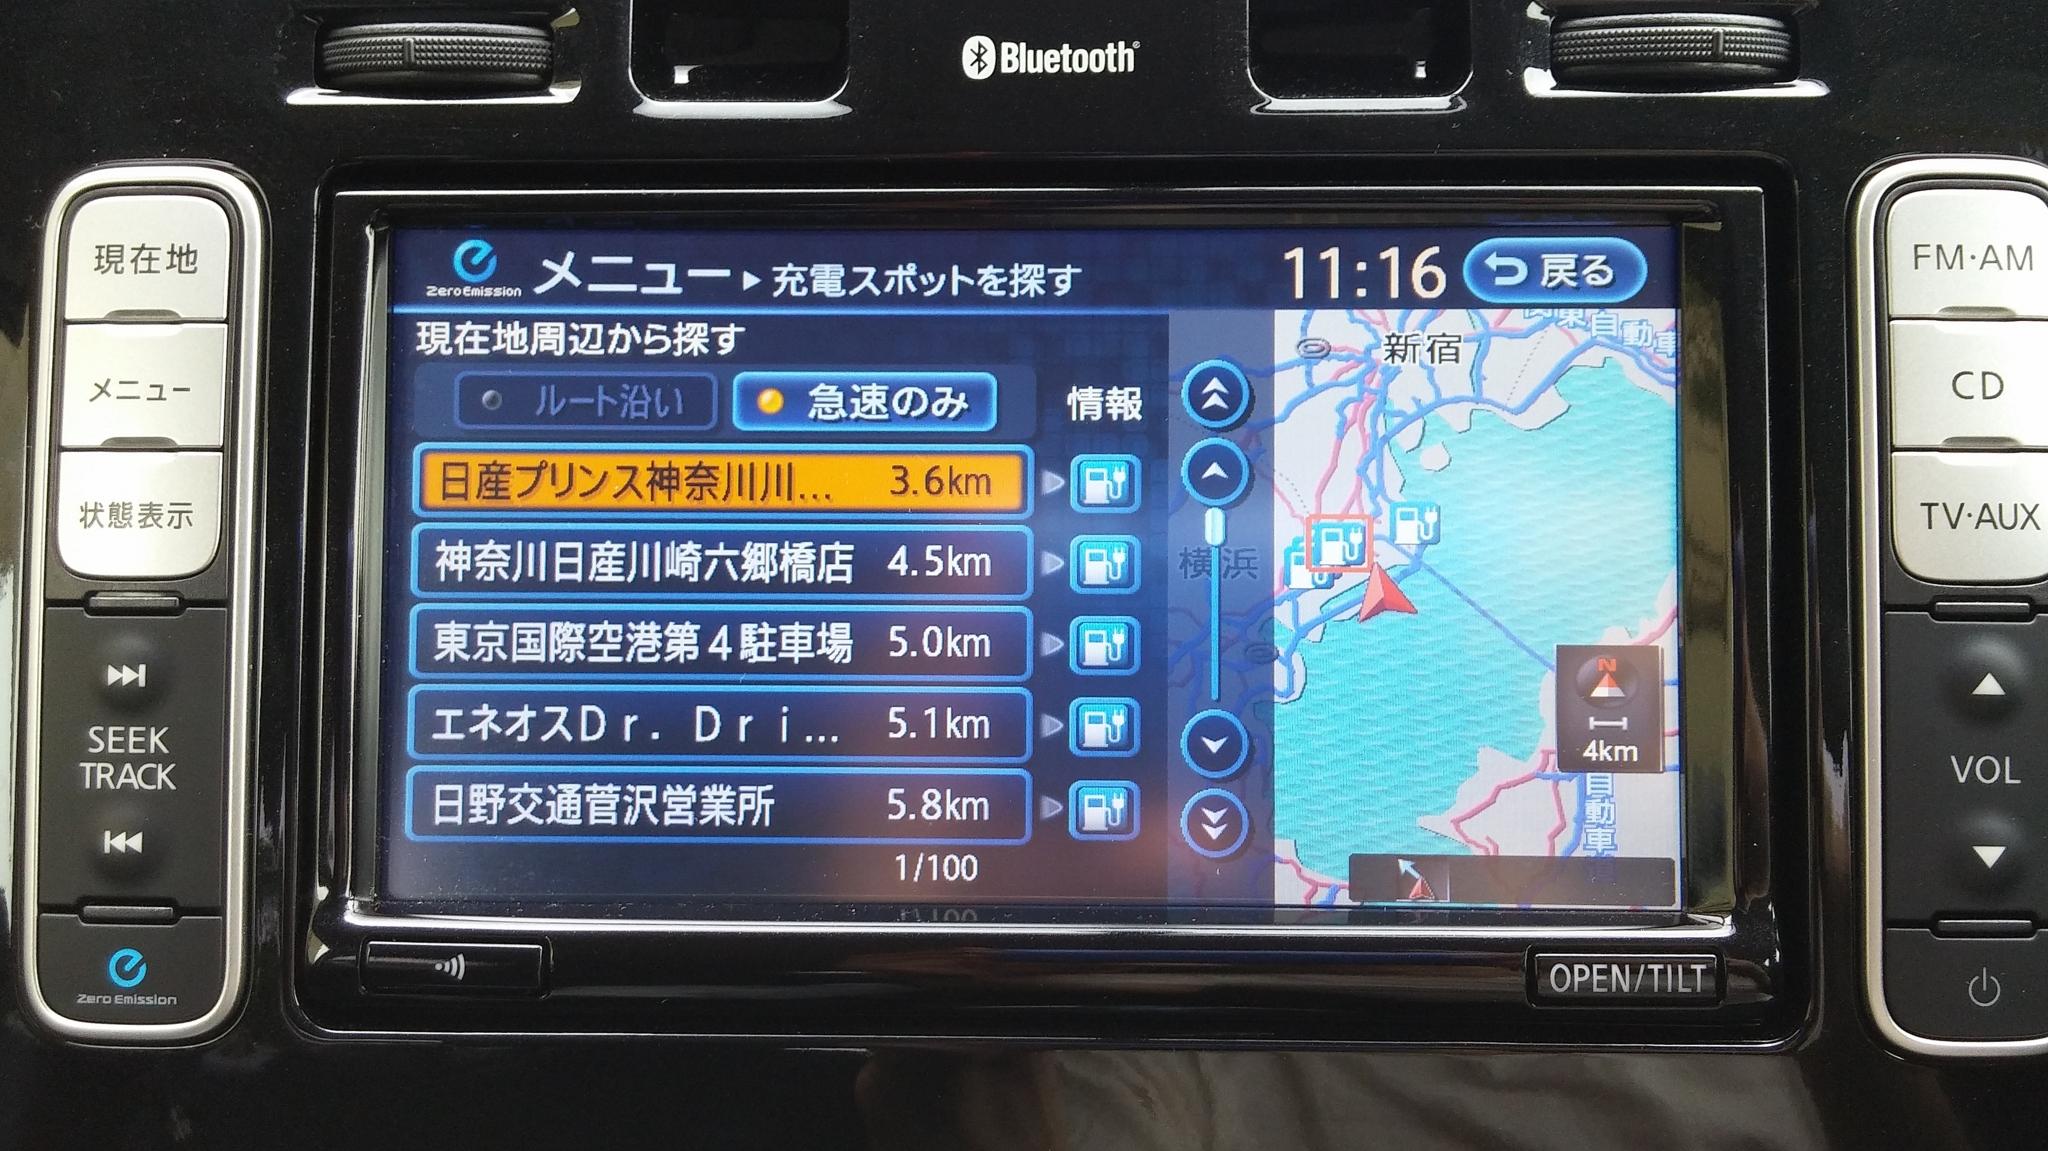 f:id:ToshUeno:20150509111650j:plain